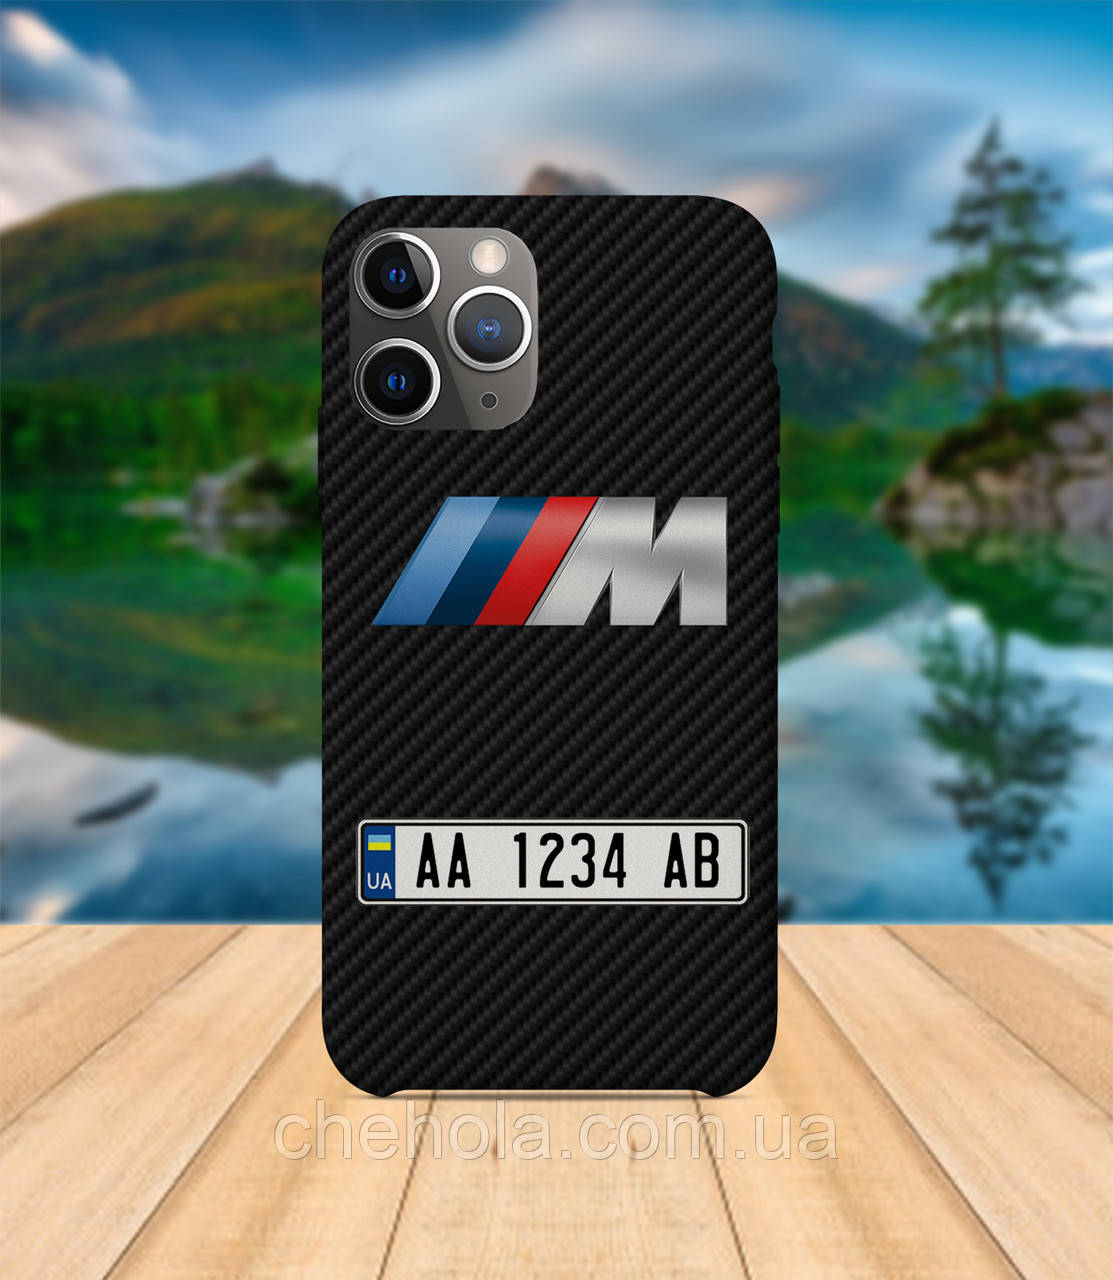 Чехол iPhone 11 PRO MAX карбон Чехол с номером авто bmw с принтом